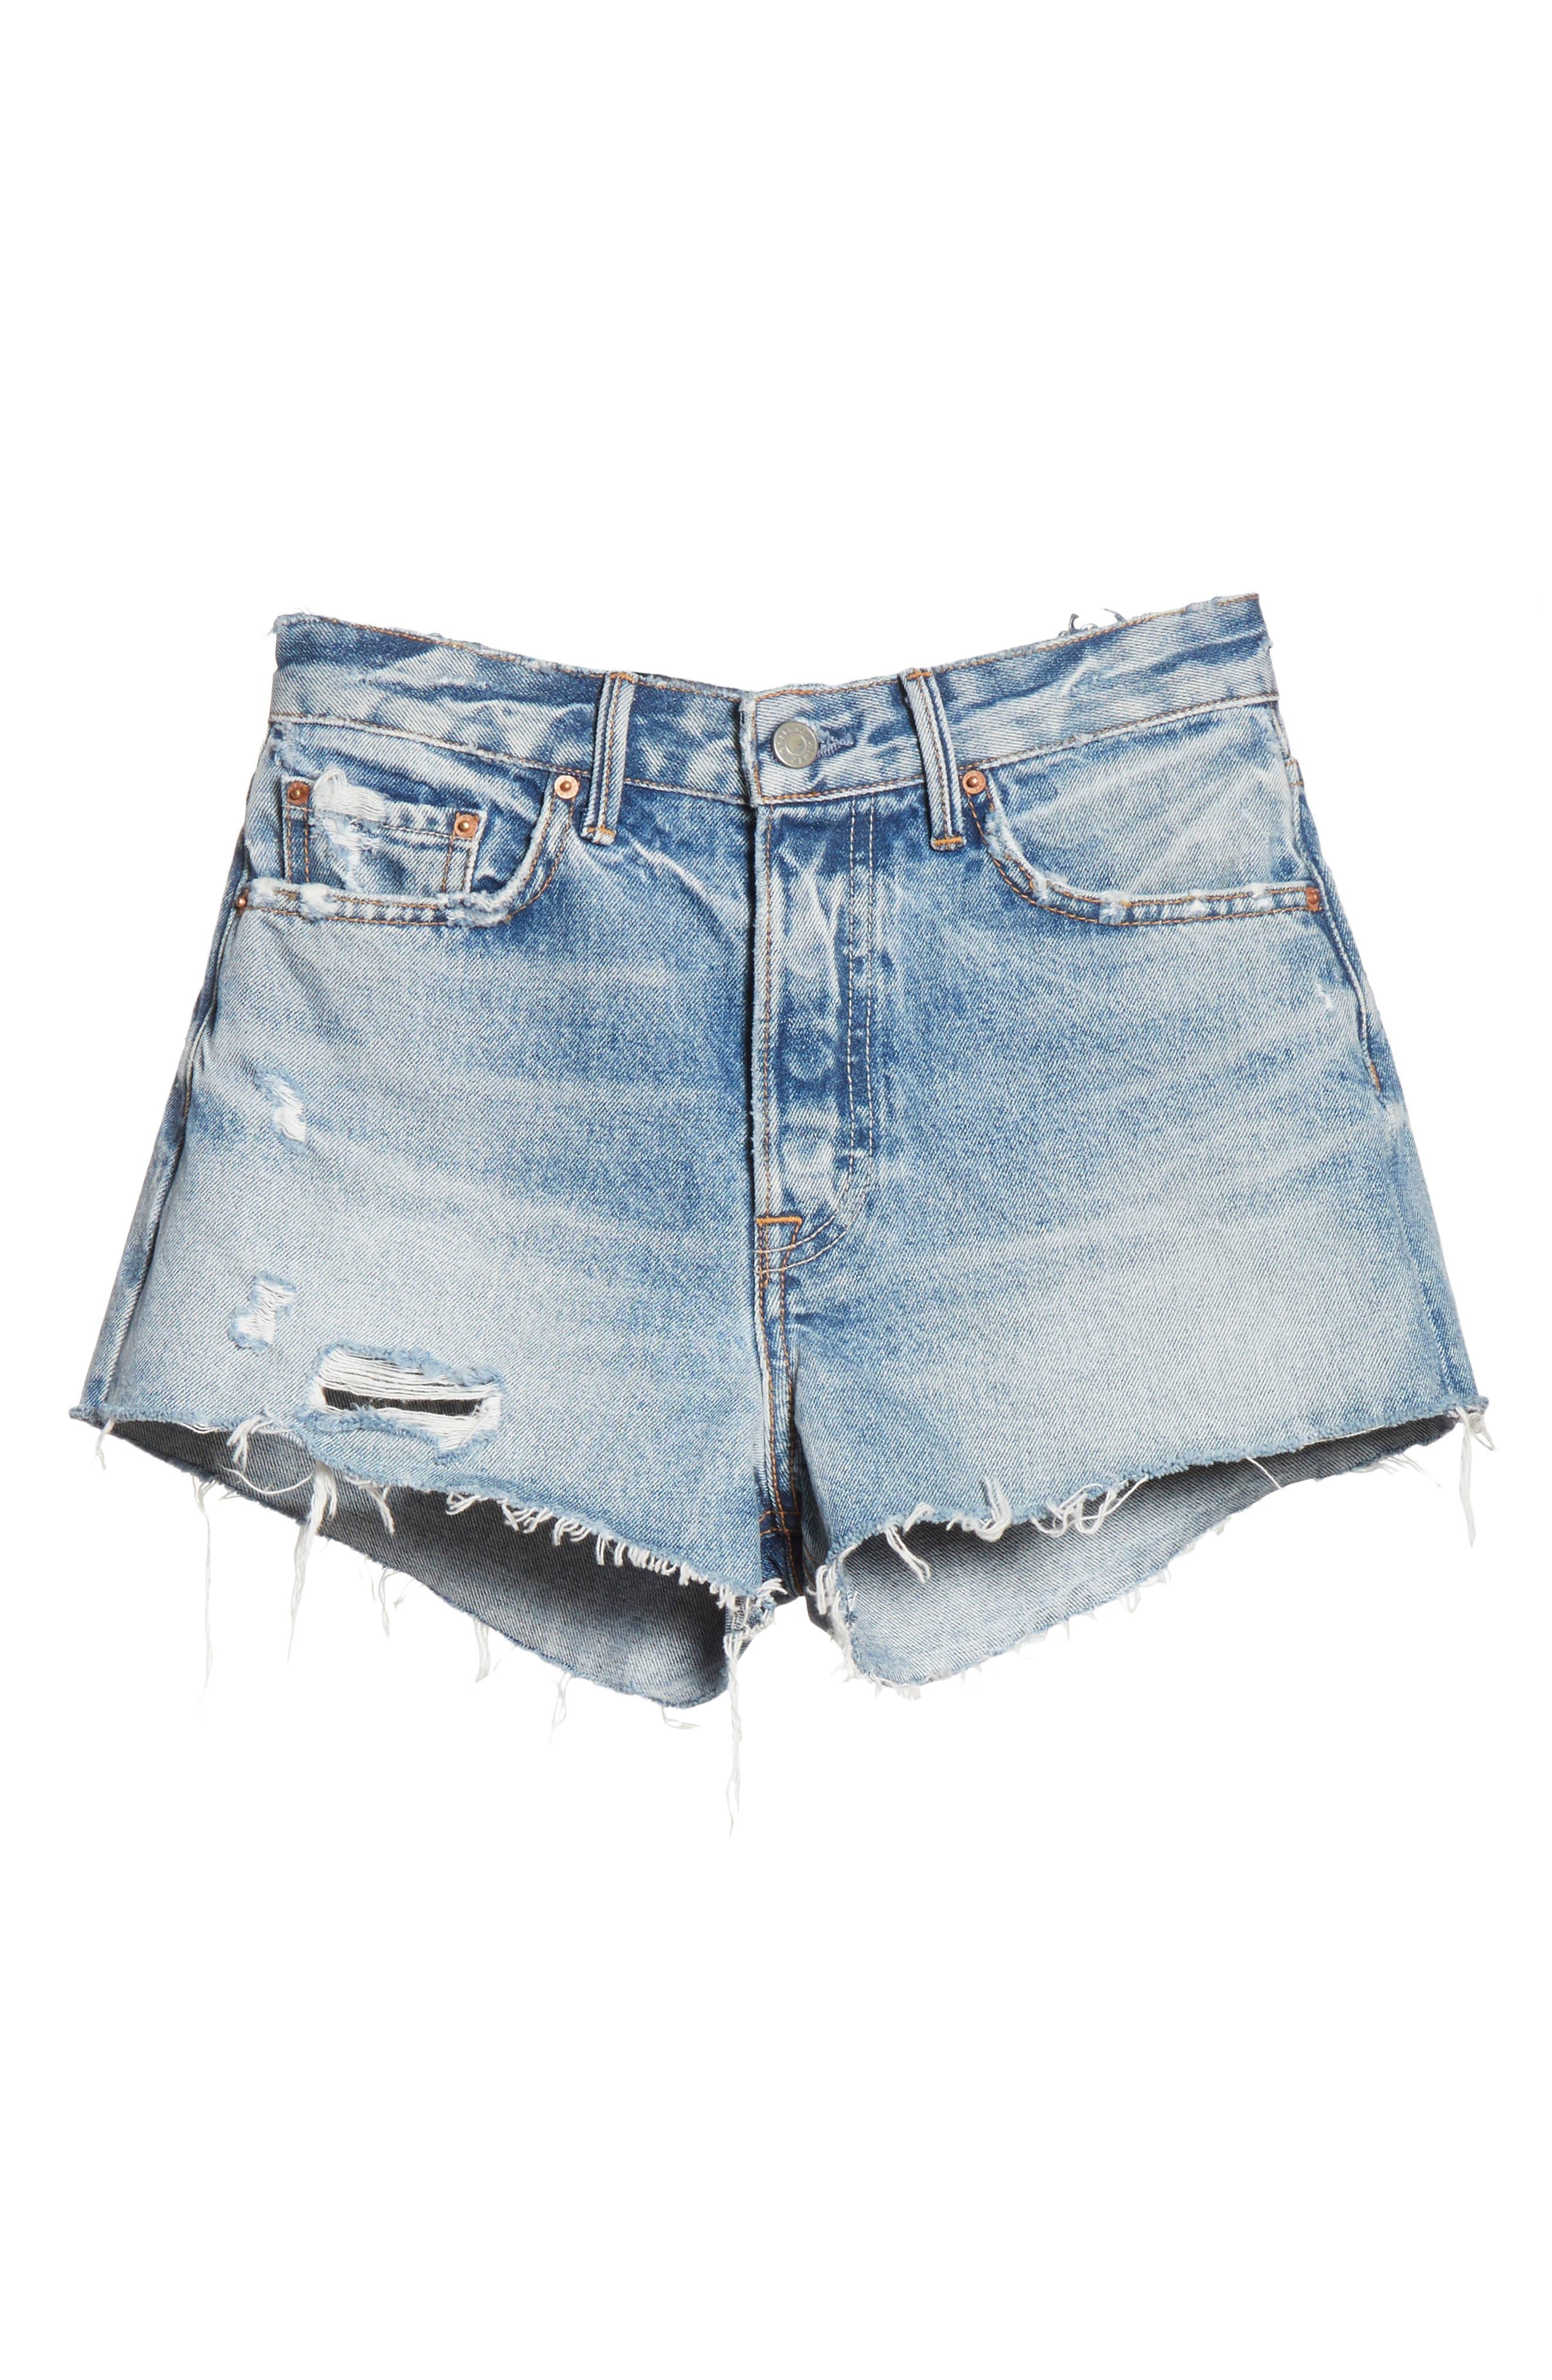 Cindy Rigid High Waist Denim Shorts,                             Alternate thumbnail 6, color,                             Stoned G601